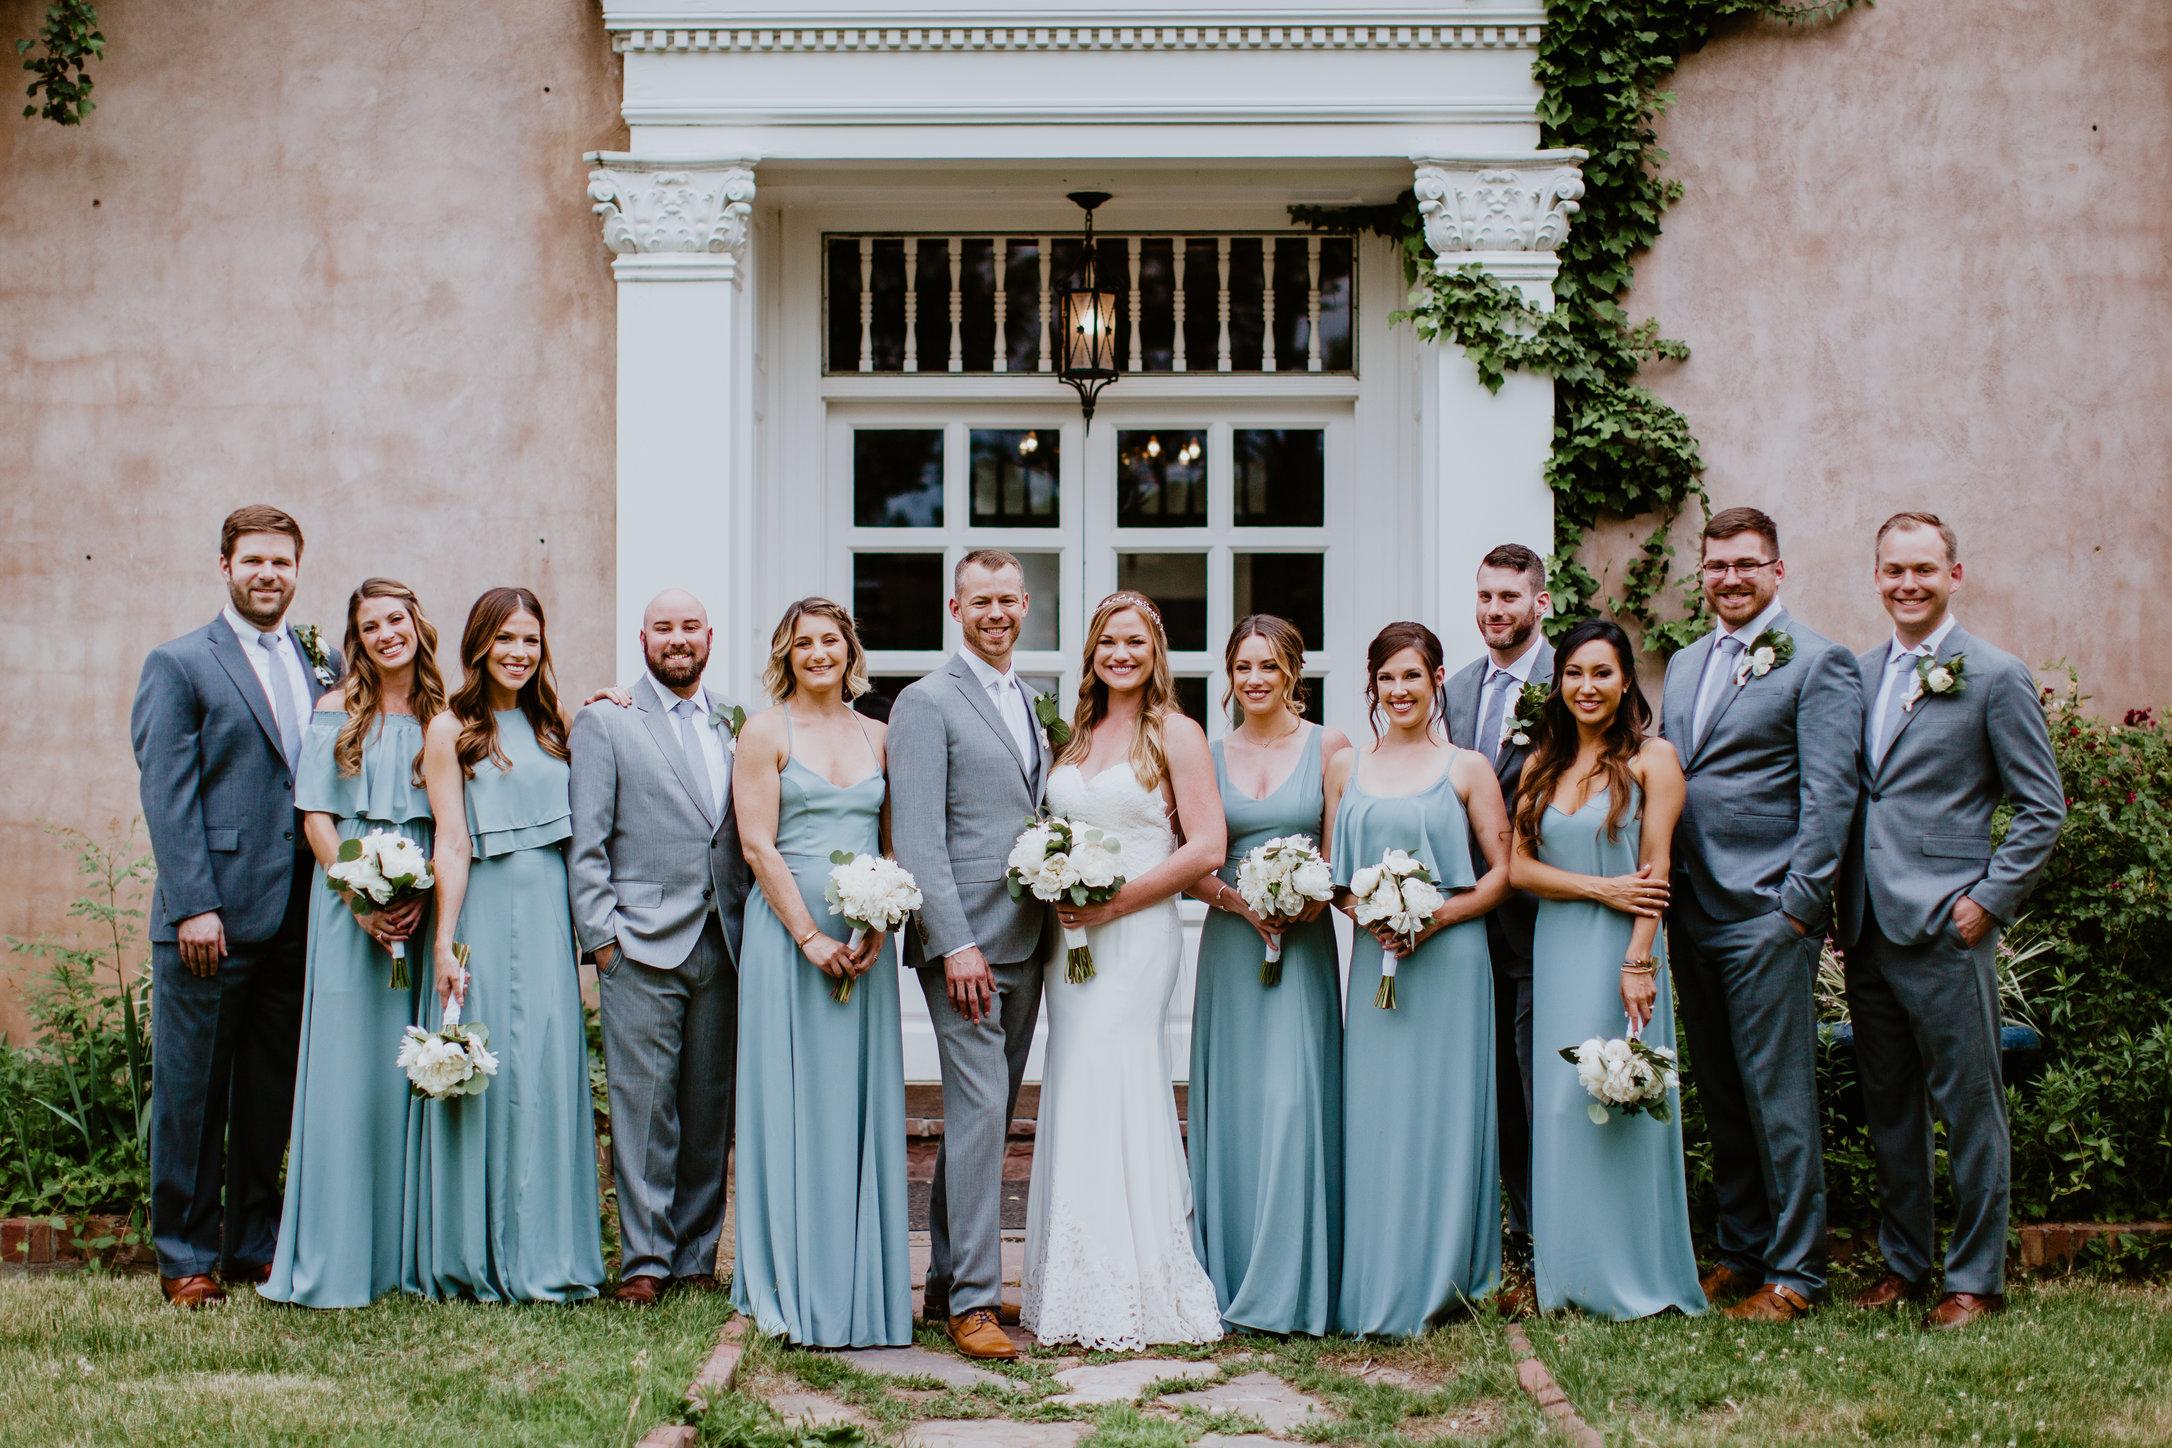 DandA-wedding-419.jpg